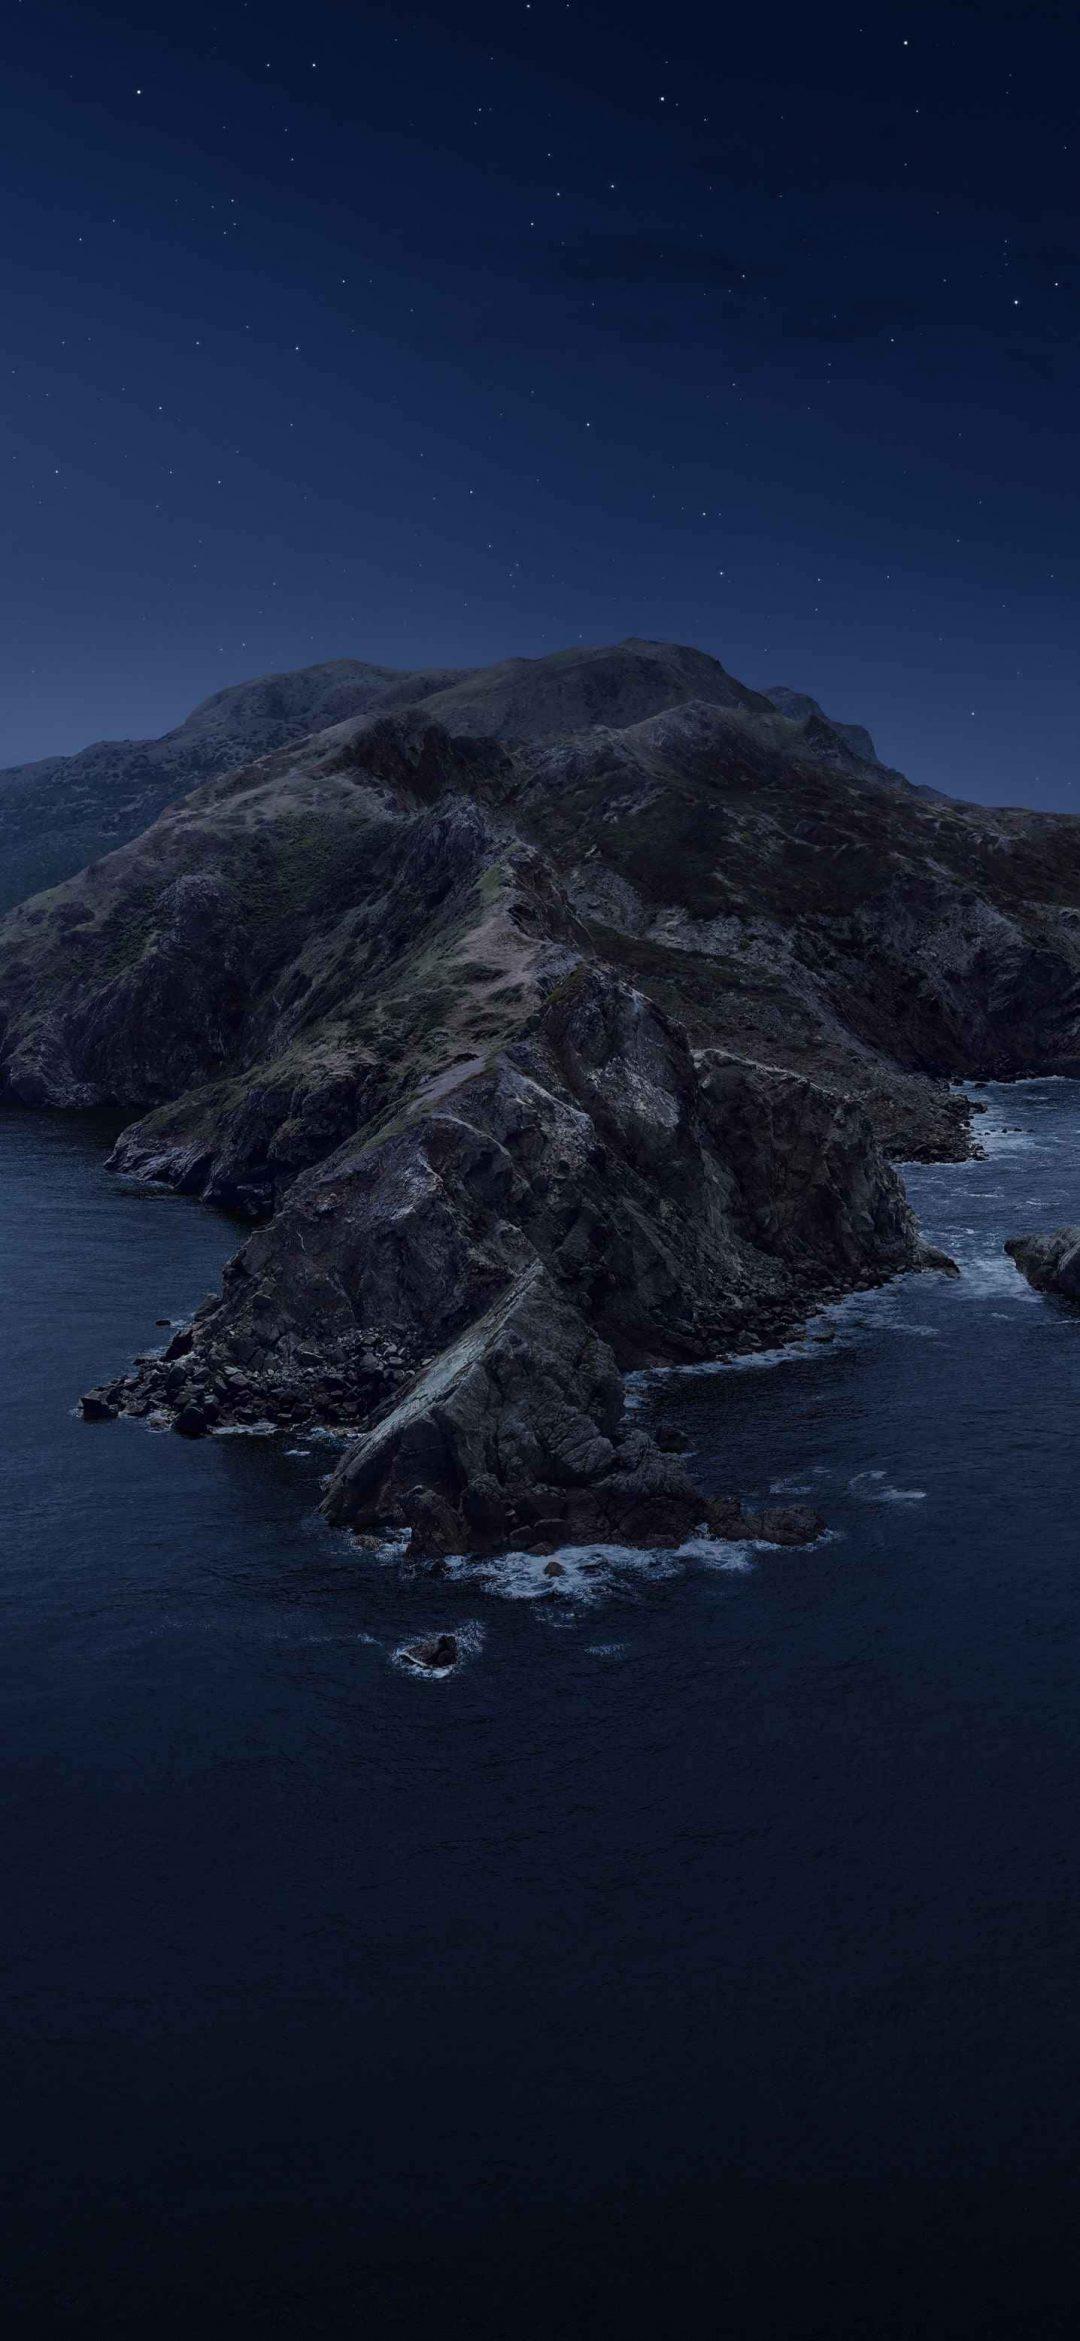 MacOS Catalina Wallpapers 4K 6K Video Wallpaper DroidViews 1080x2341